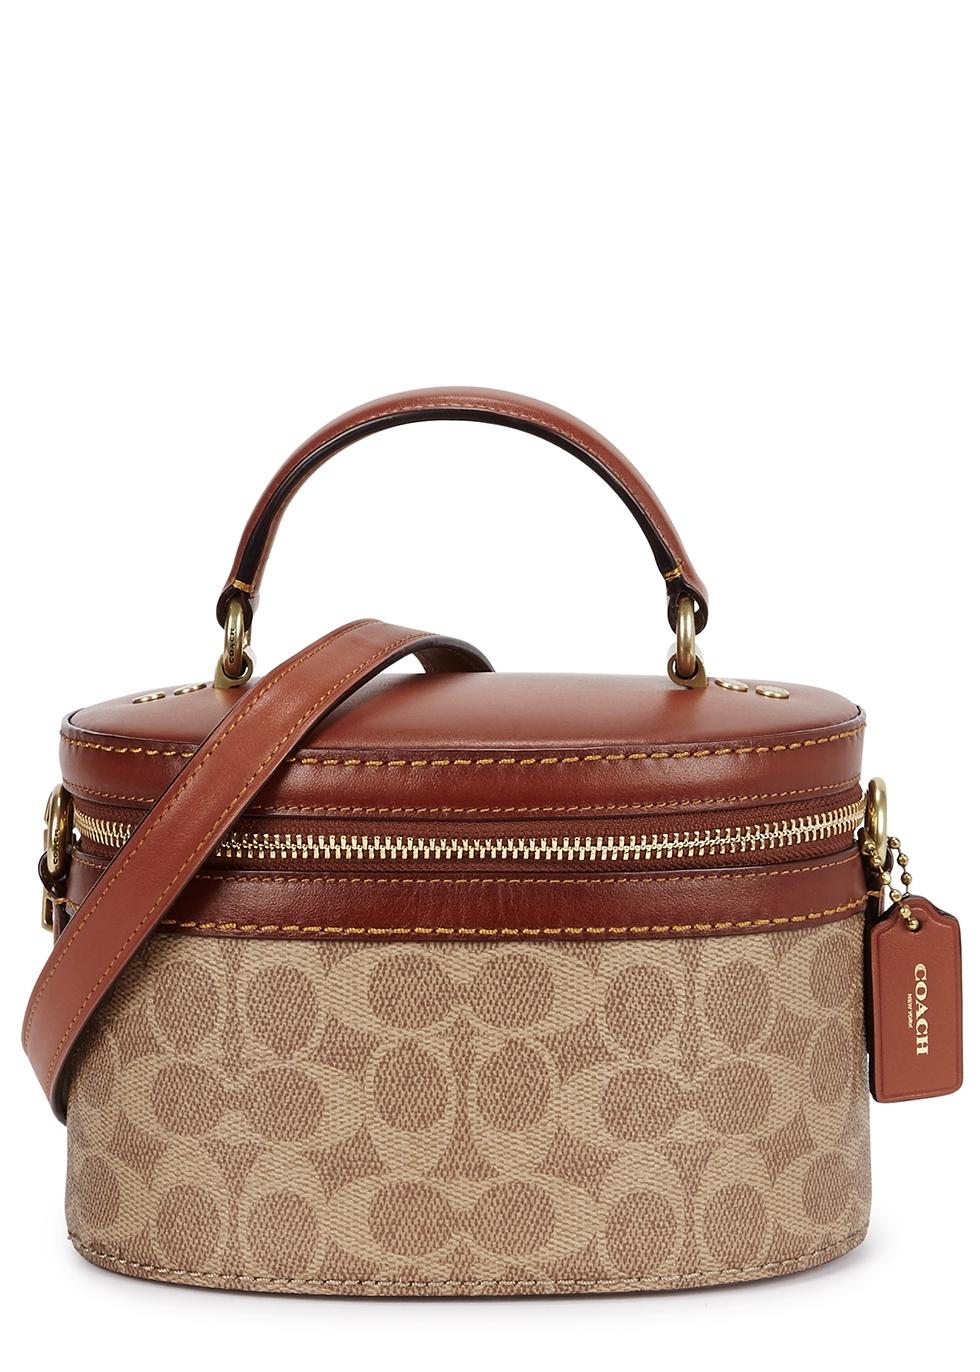 Tan leather bucket bag - Coach